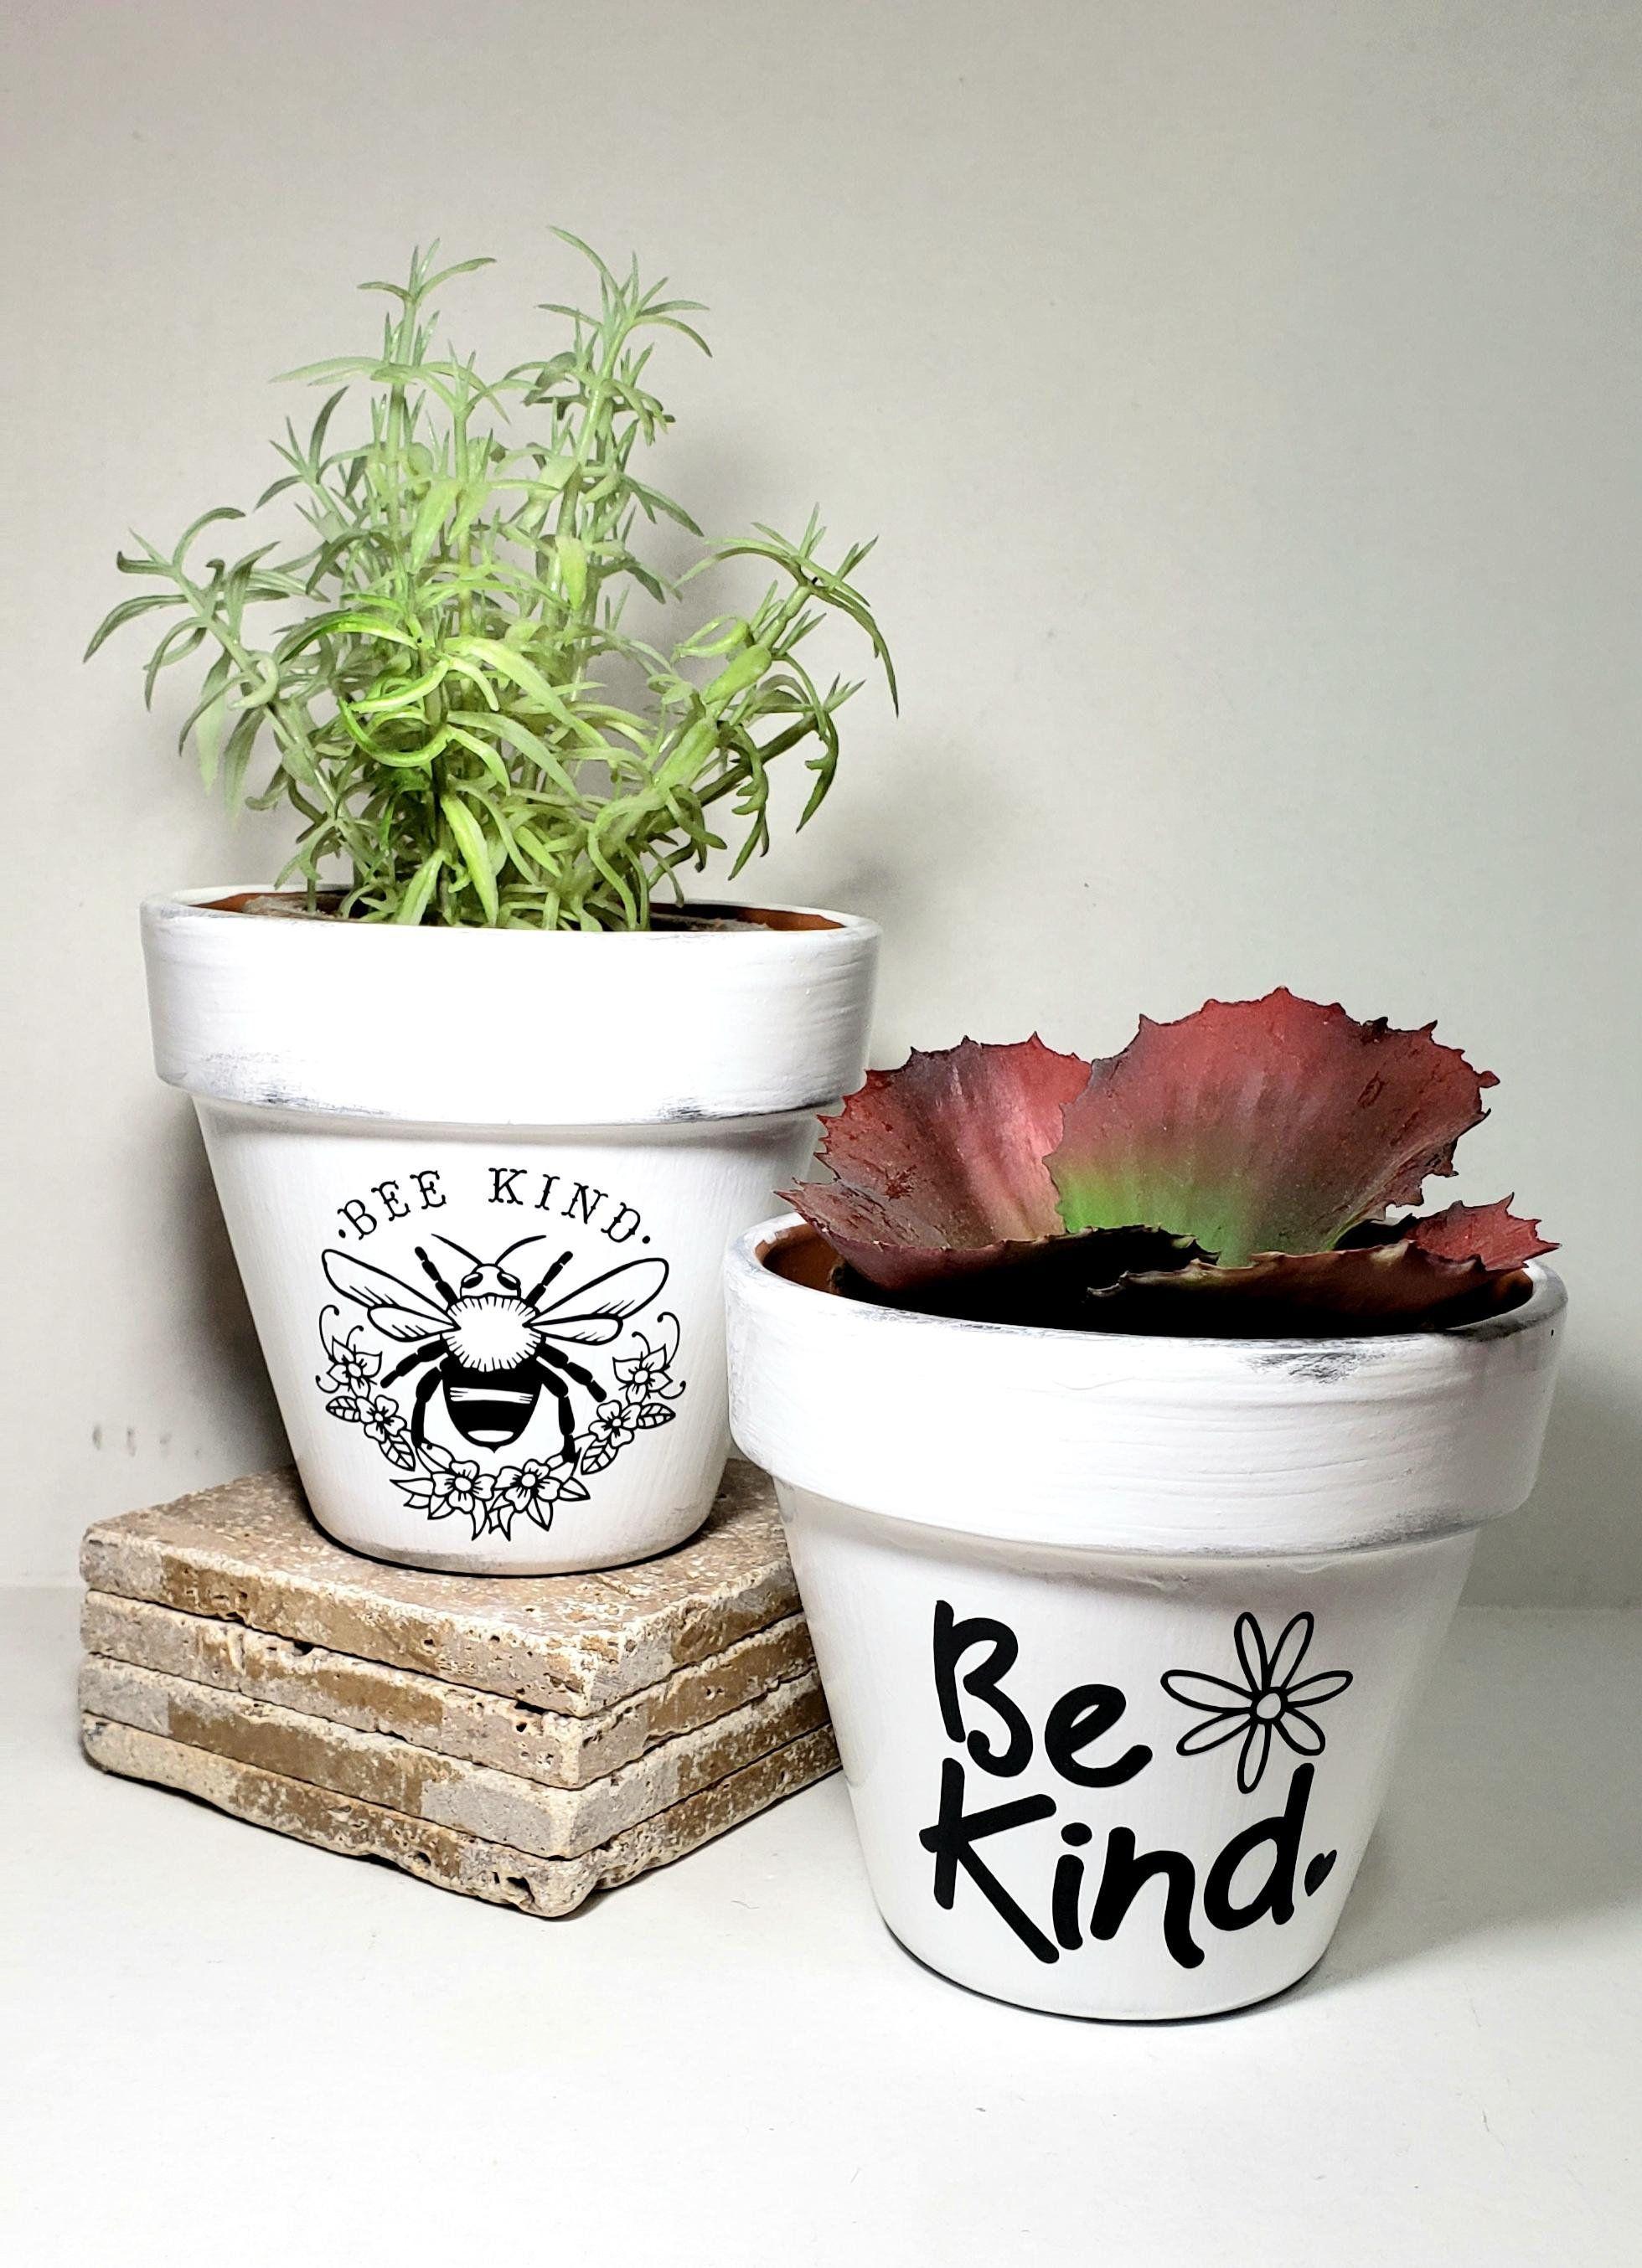 Be Kind Flower Pots Gardener Gift Bee Kind Kindness Matters Teacher Gift Coworker Gift Gift For Her 4 Inch Flowe Flower Pots Garden Gifts Save The Bees